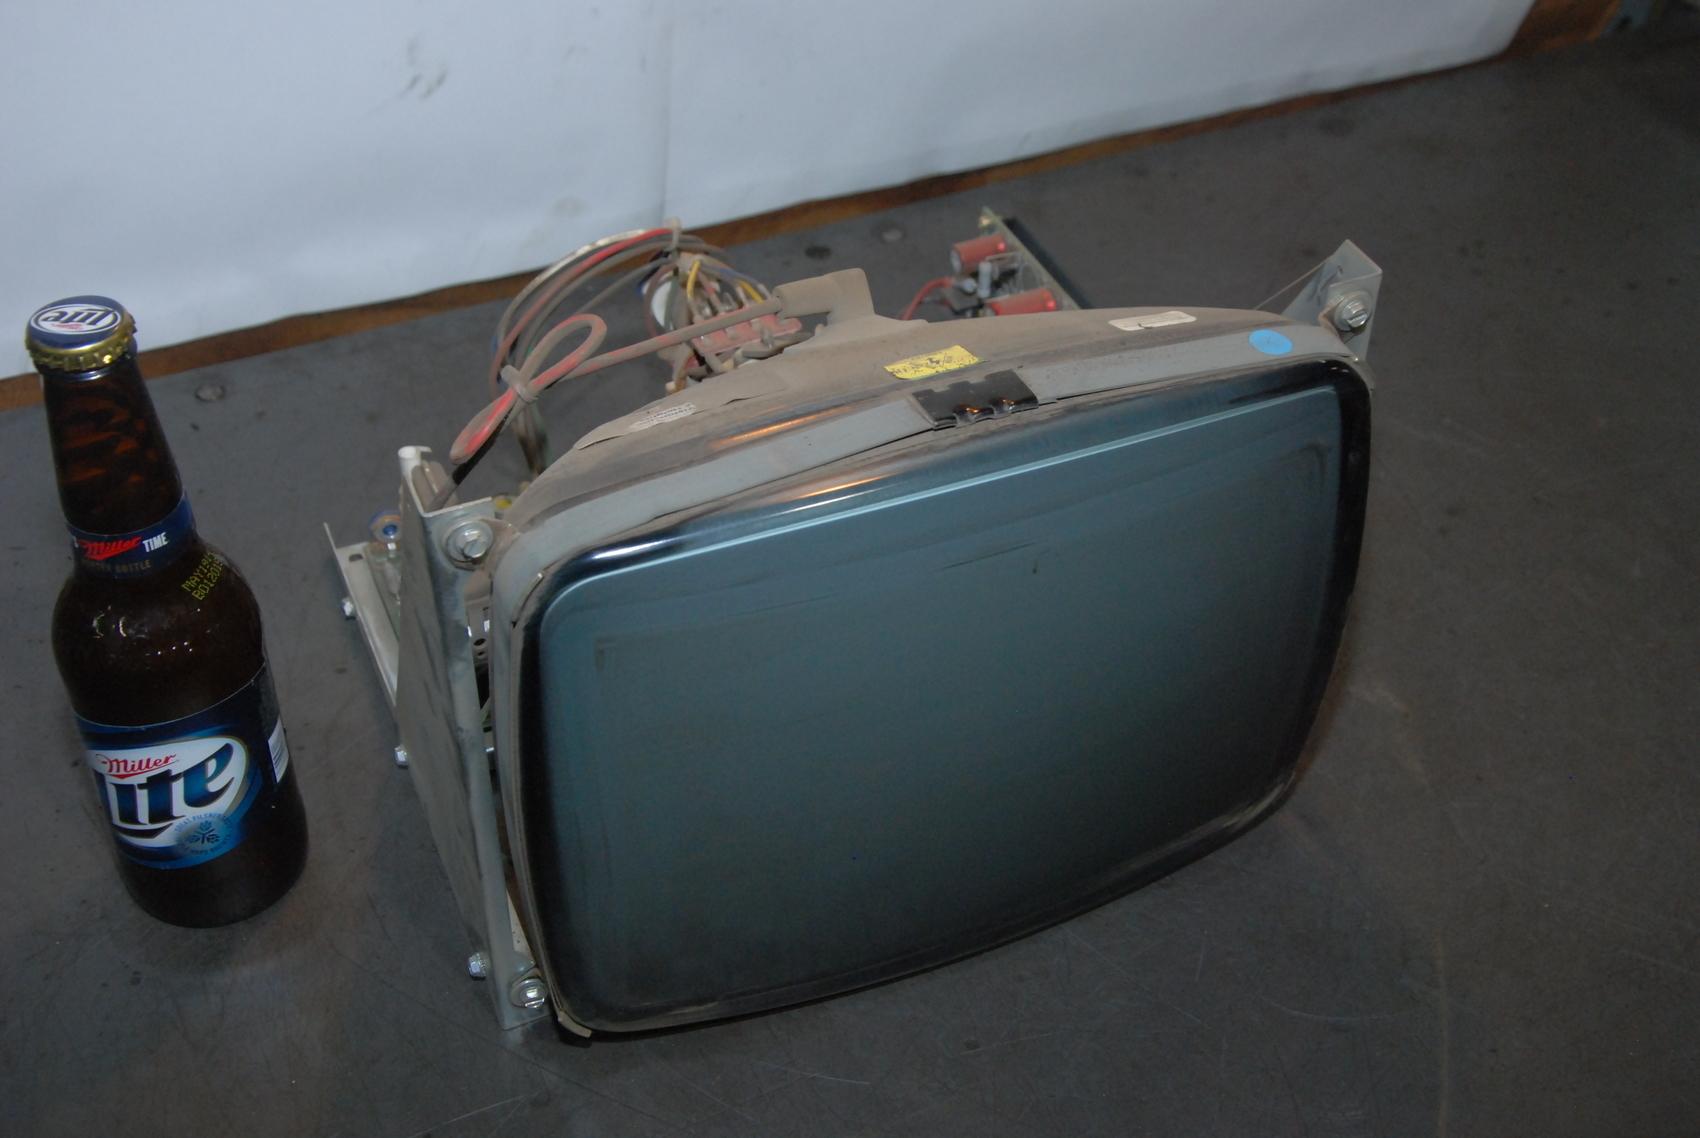 OMNI VISION LP1218FHW crt CNC MONITOR TV MAZAK OKUMA